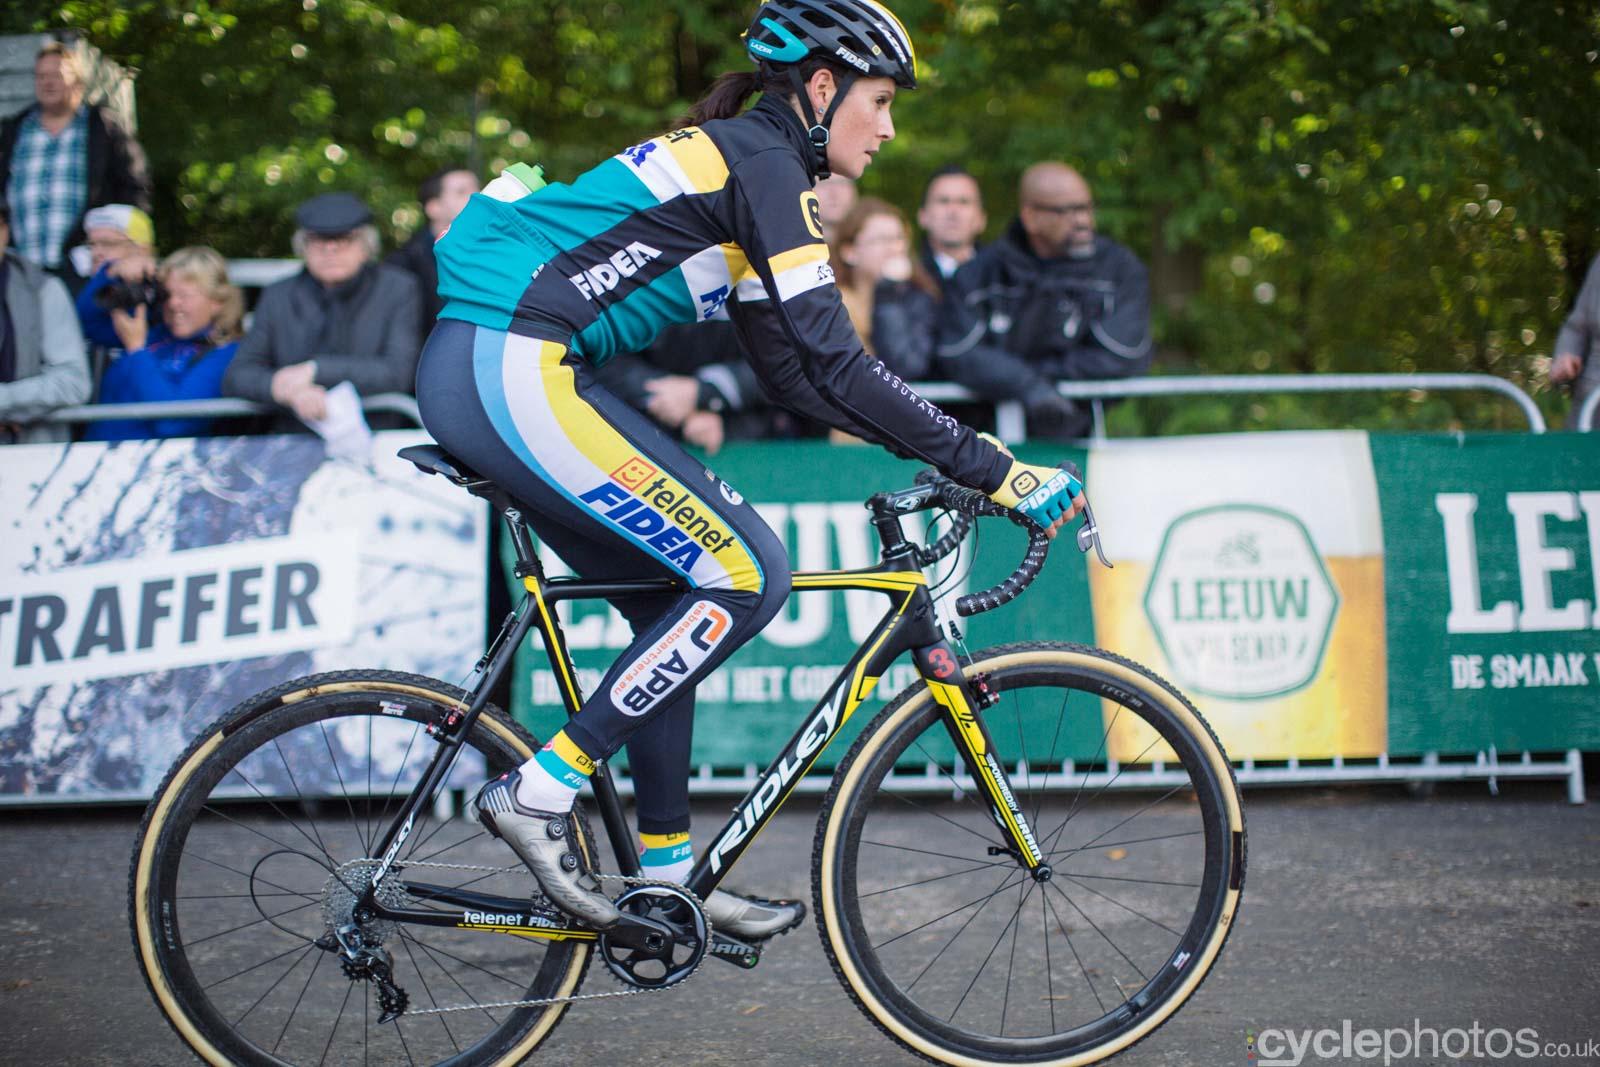 2015-cyclephotos-cyclocross-valkenburg-132315-nikki-harris